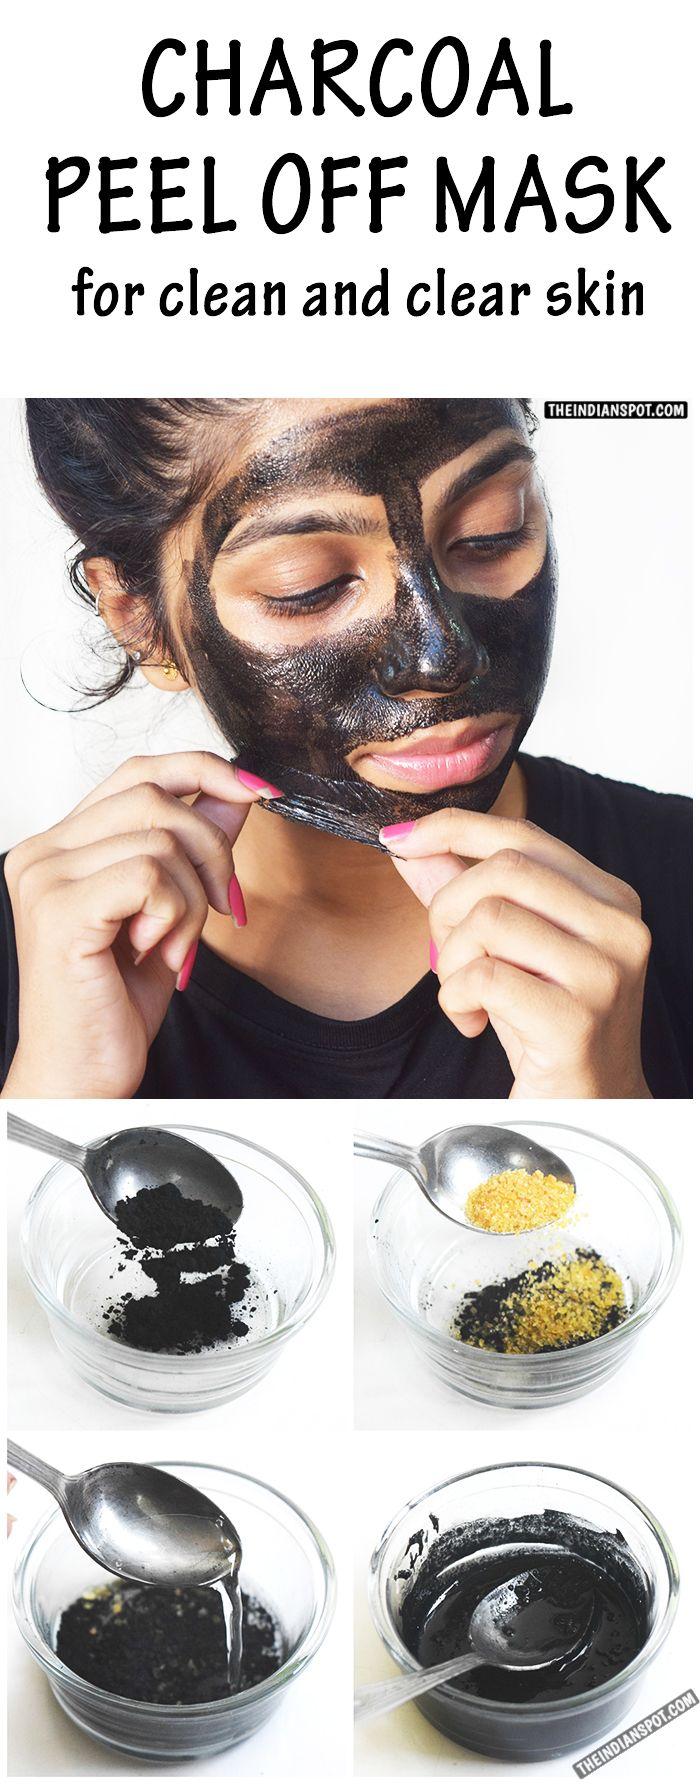 Beauty hacks | beauty tips | makeup | diy beauty | beauty tips for women | beauty secrets | beauty products | natural beauty products | beauty routine | beauty tricks | beauty blogger | nails